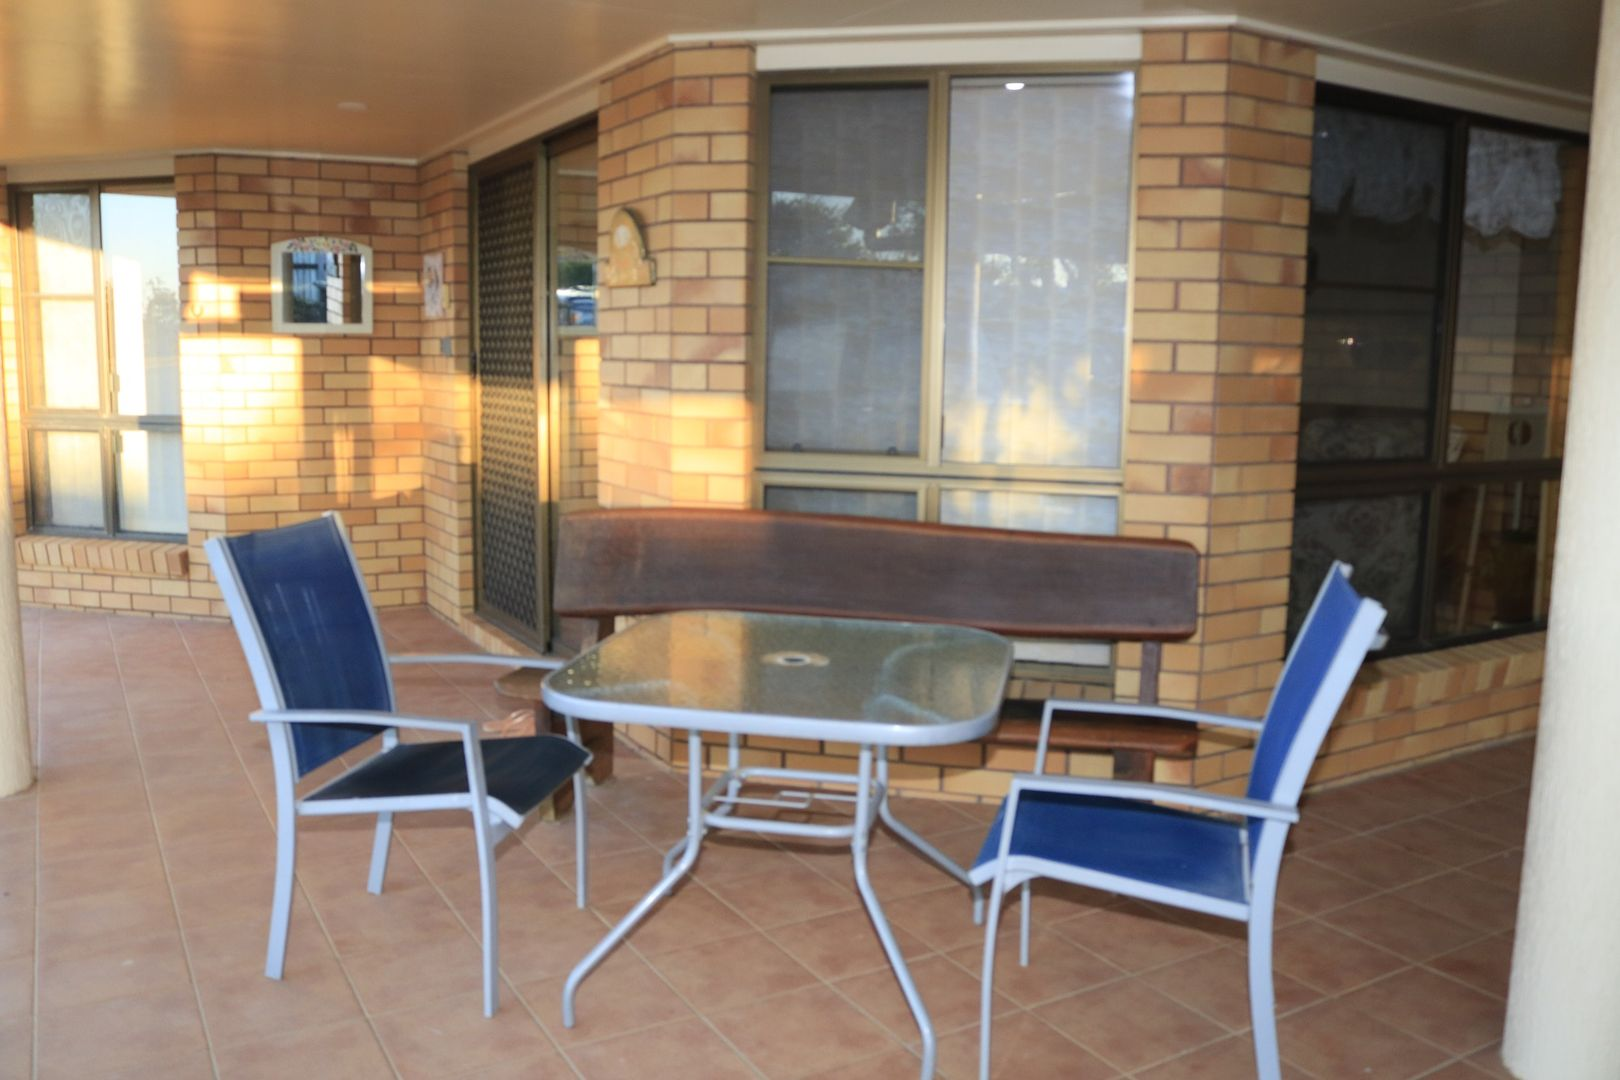 17-19 Charles Street, Mundubbera QLD 4626, Image 2